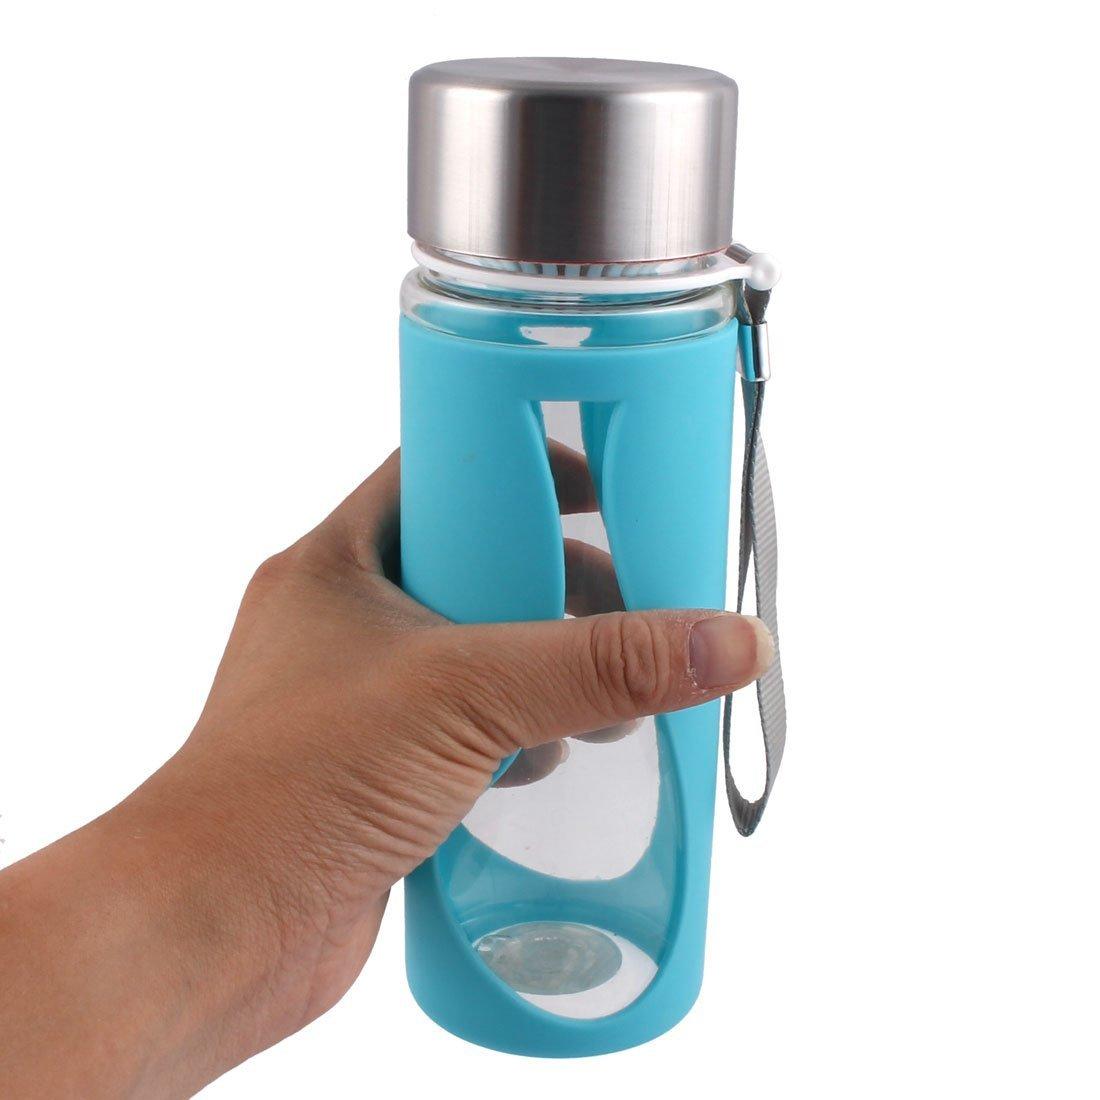 Amazon.com : eDealMax plástico Camping colador de té que Bebe la Botella de agua del Deporte Taza de la Taza de 500 ml Azul del trullo : Sports & Outdoors